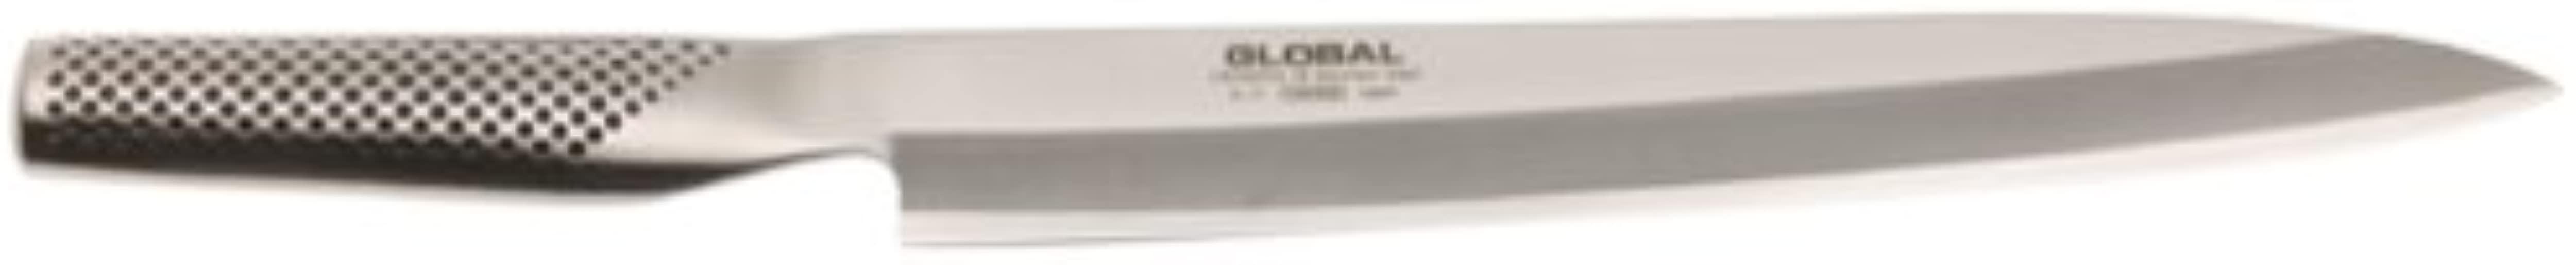 Global G 11 Yanagi Sashimi Knife 10 Inch